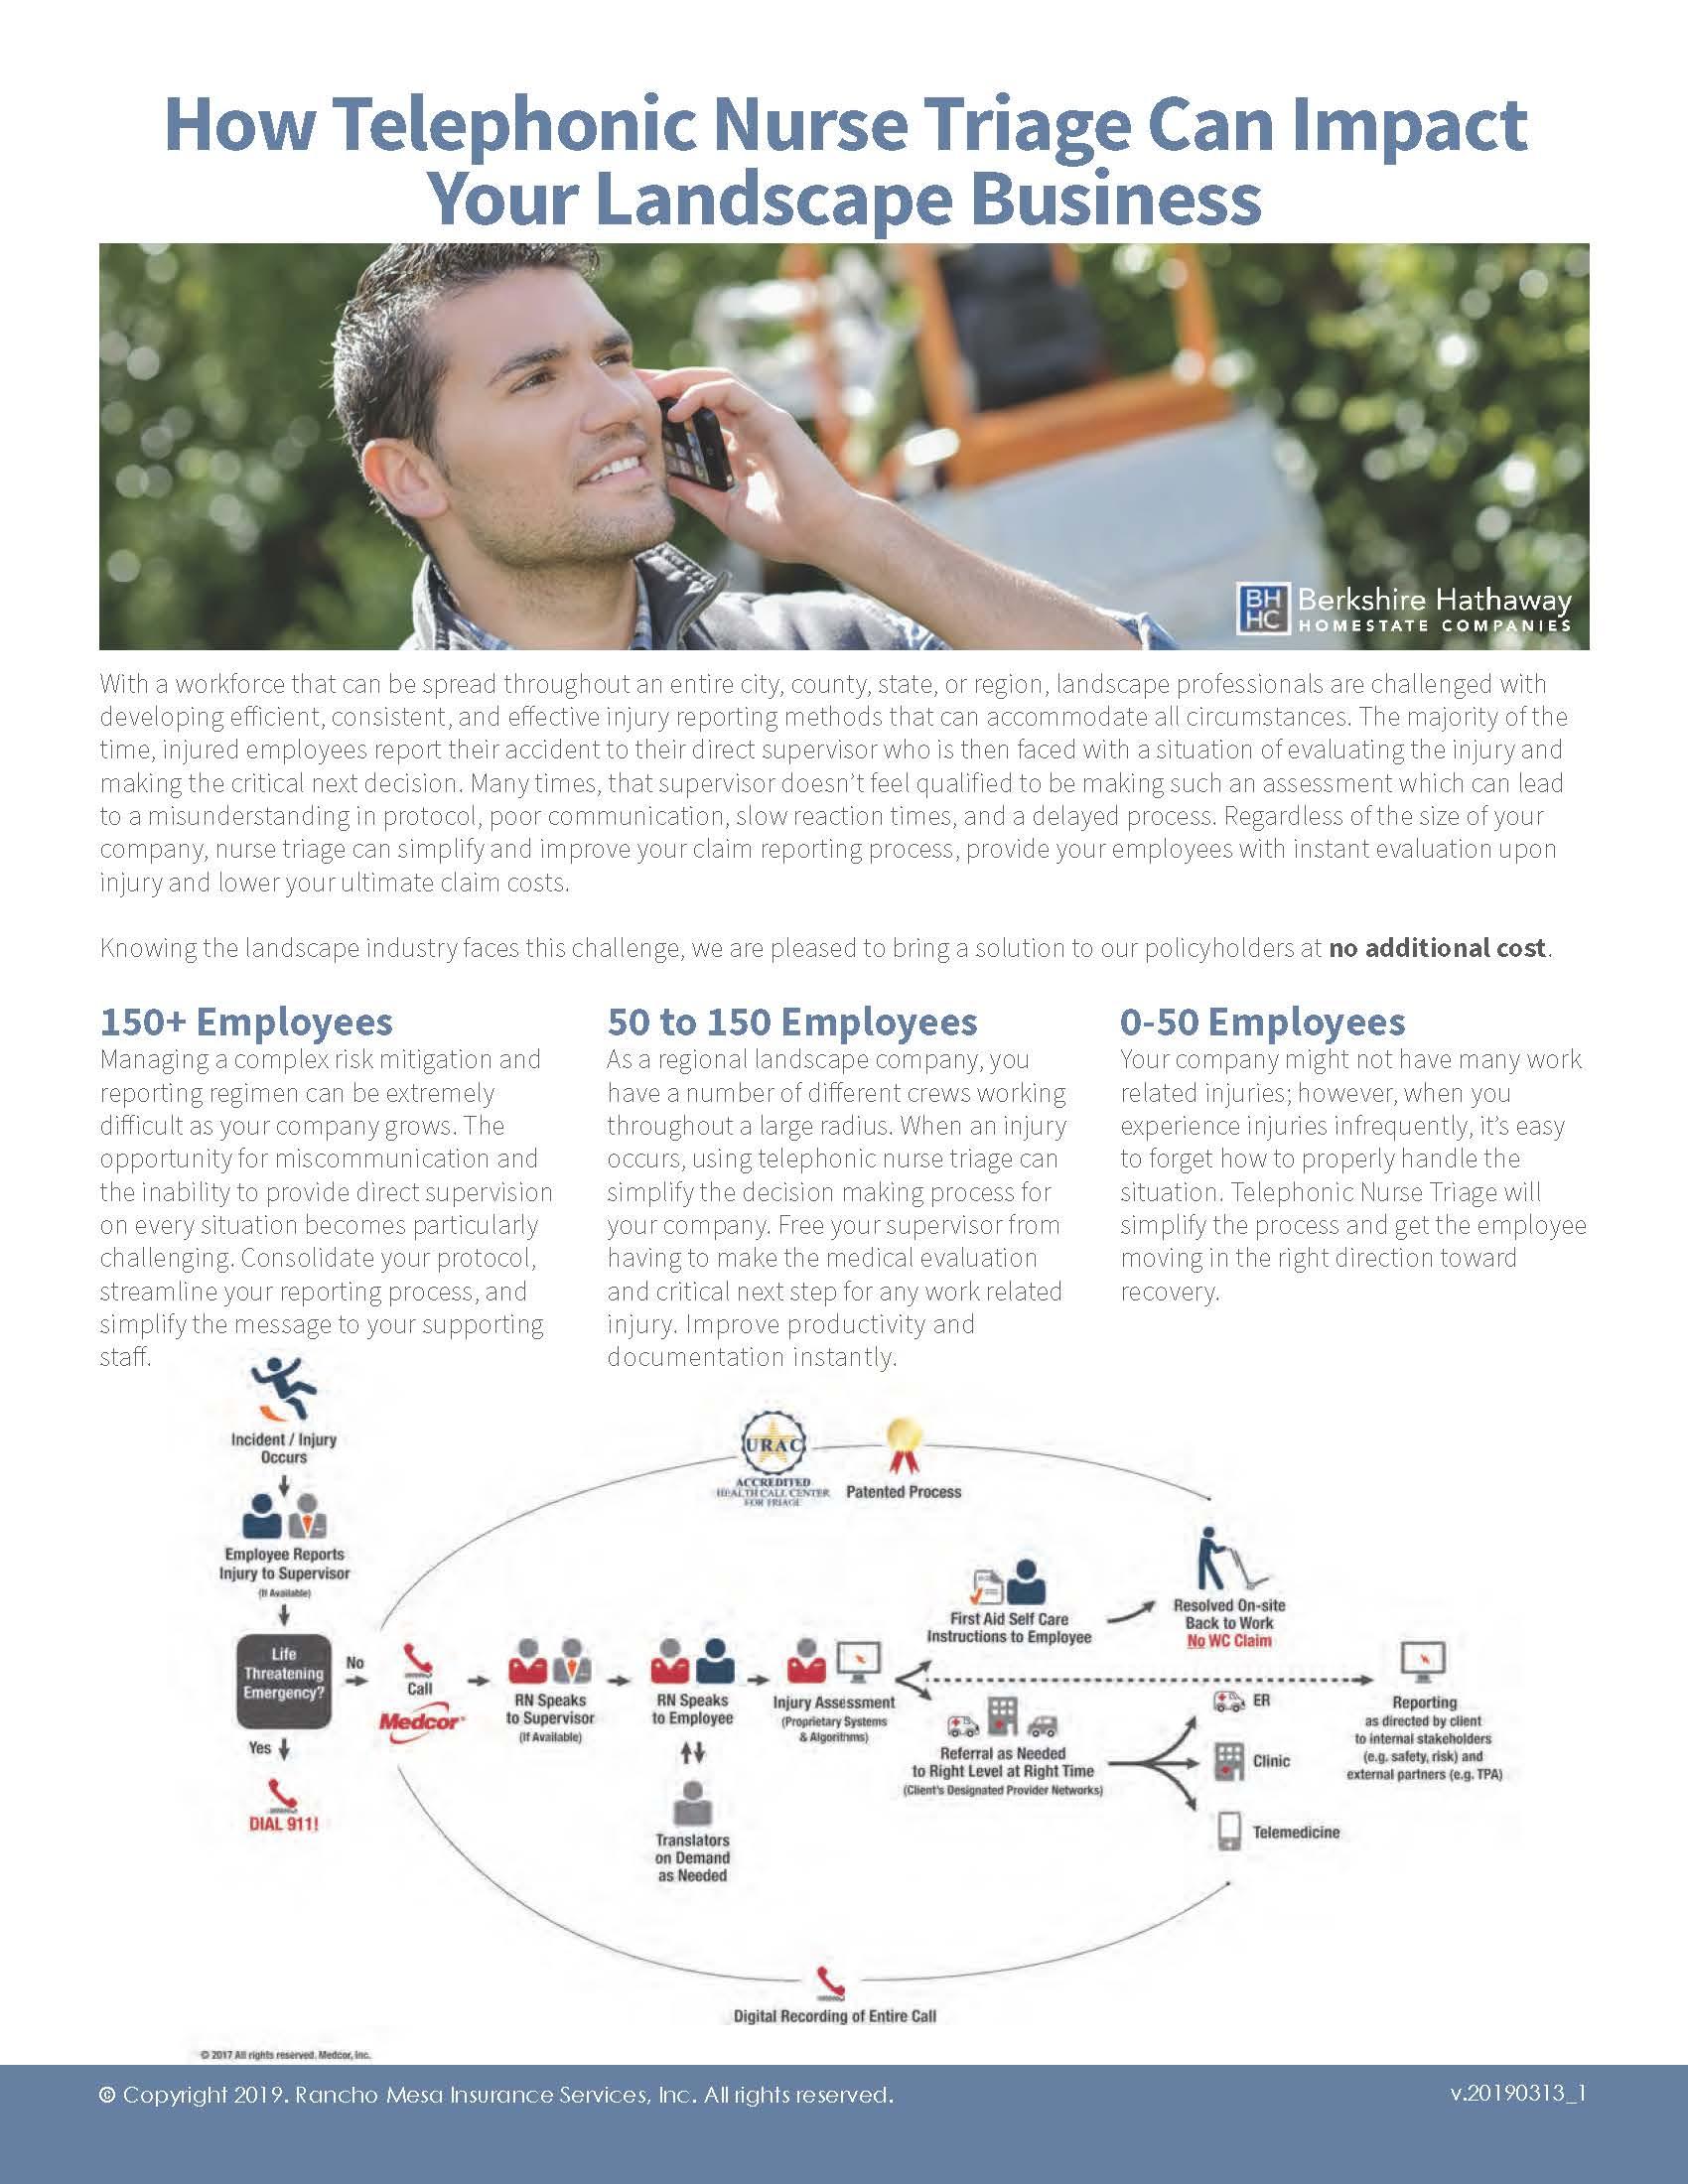 Telephonic Nurse Triage for Landscape Businesses